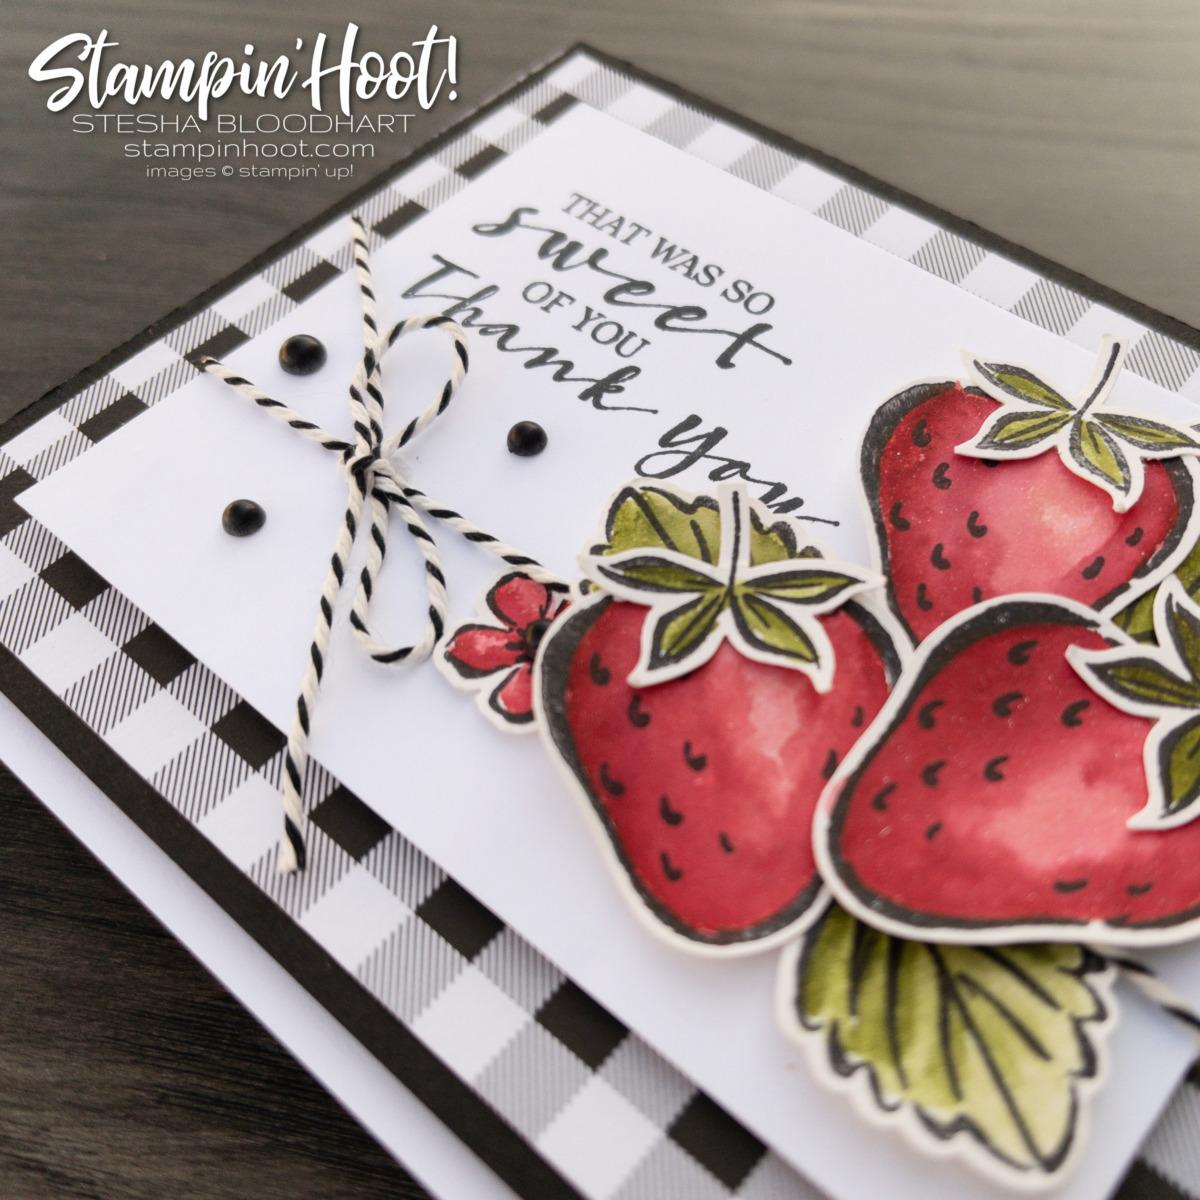 Sweet Strawberry Bundle Thank You Card by Stesha Bloodhart. Stampin' Hoot!